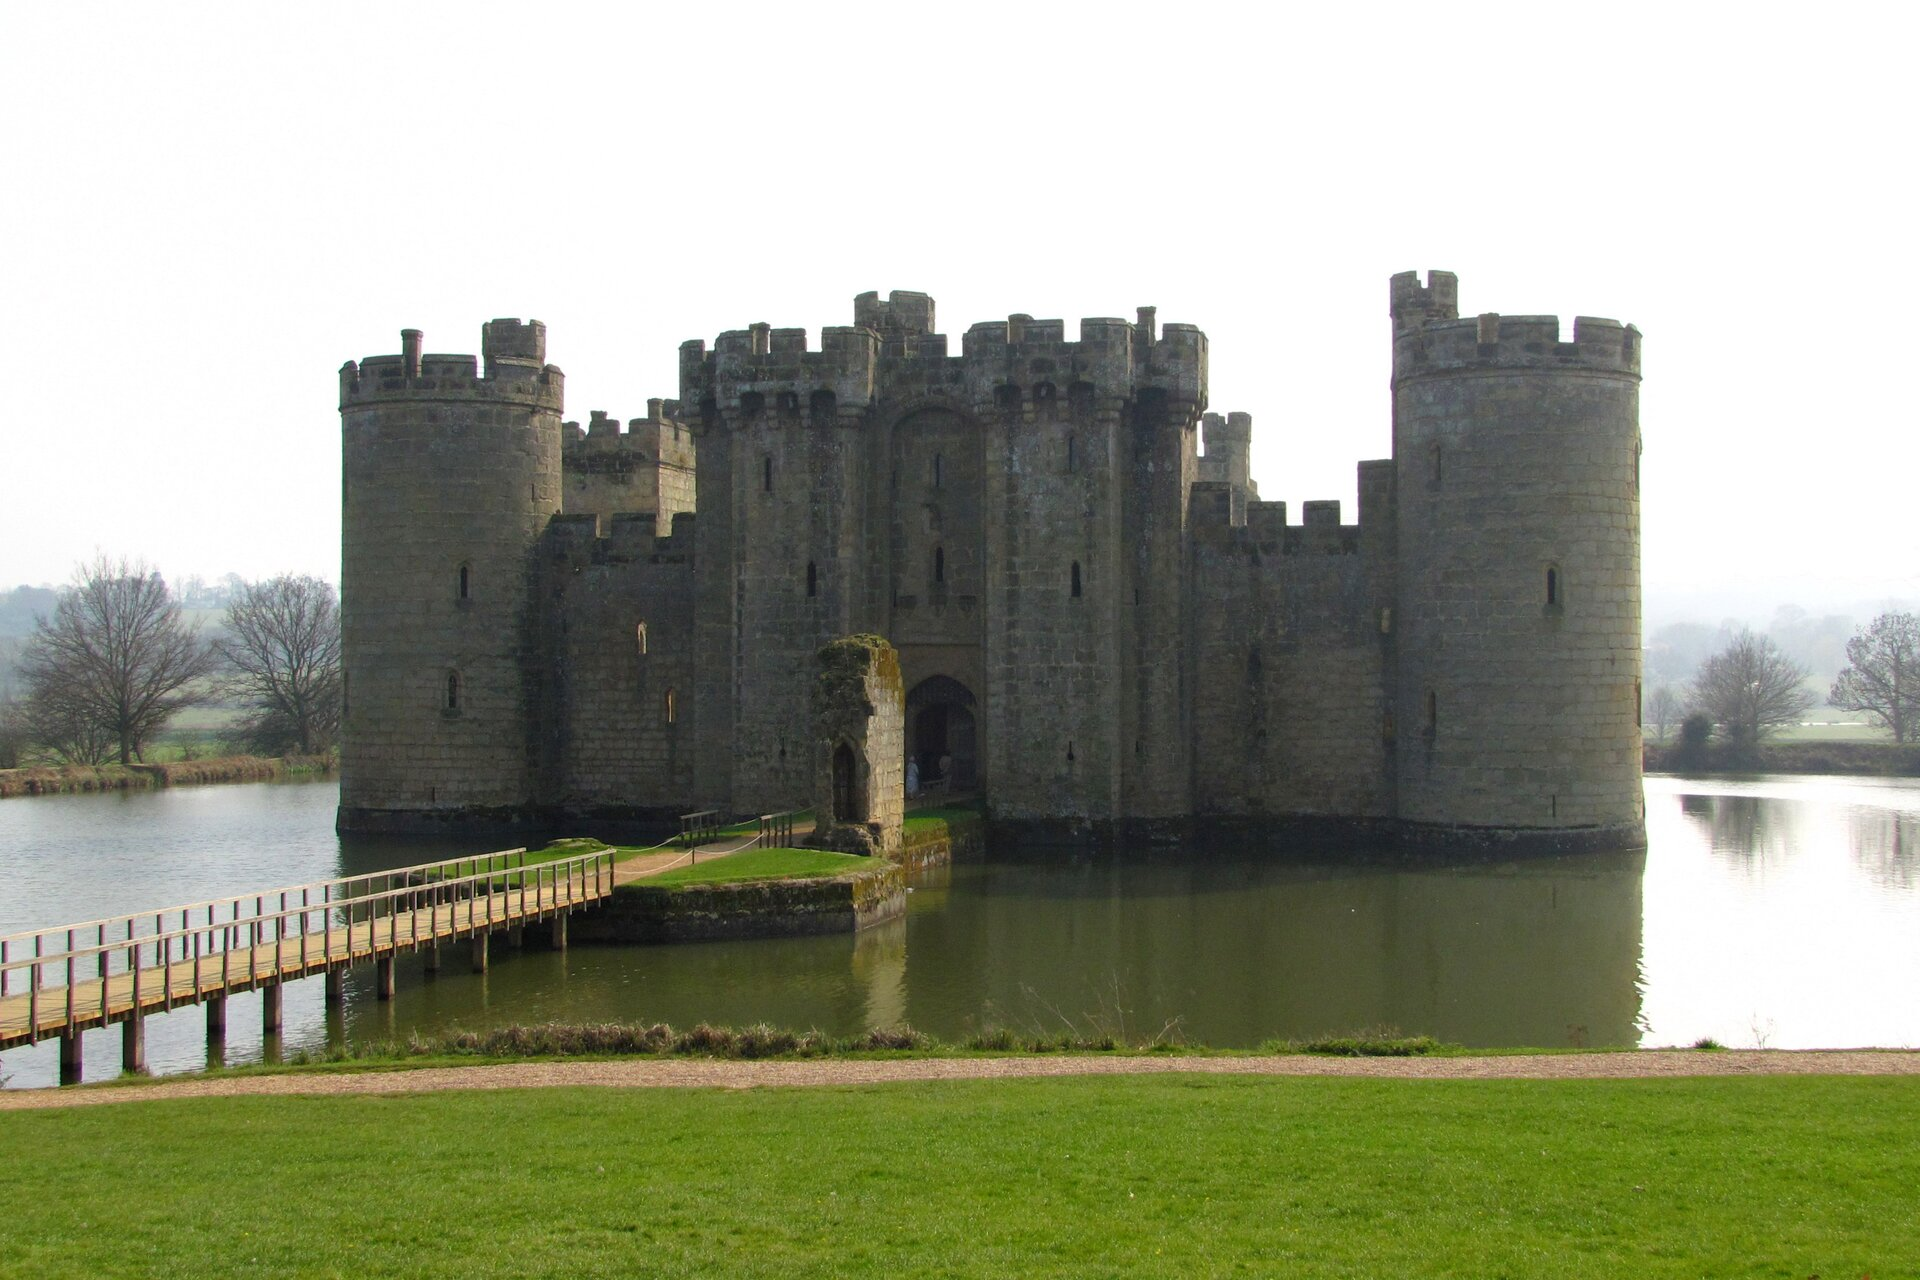 Zamek Bodiam wAnglii Zamek Bodiam wAnglii Źródło: Dan Davison, Flickr, licencja: CC BY 2.0.